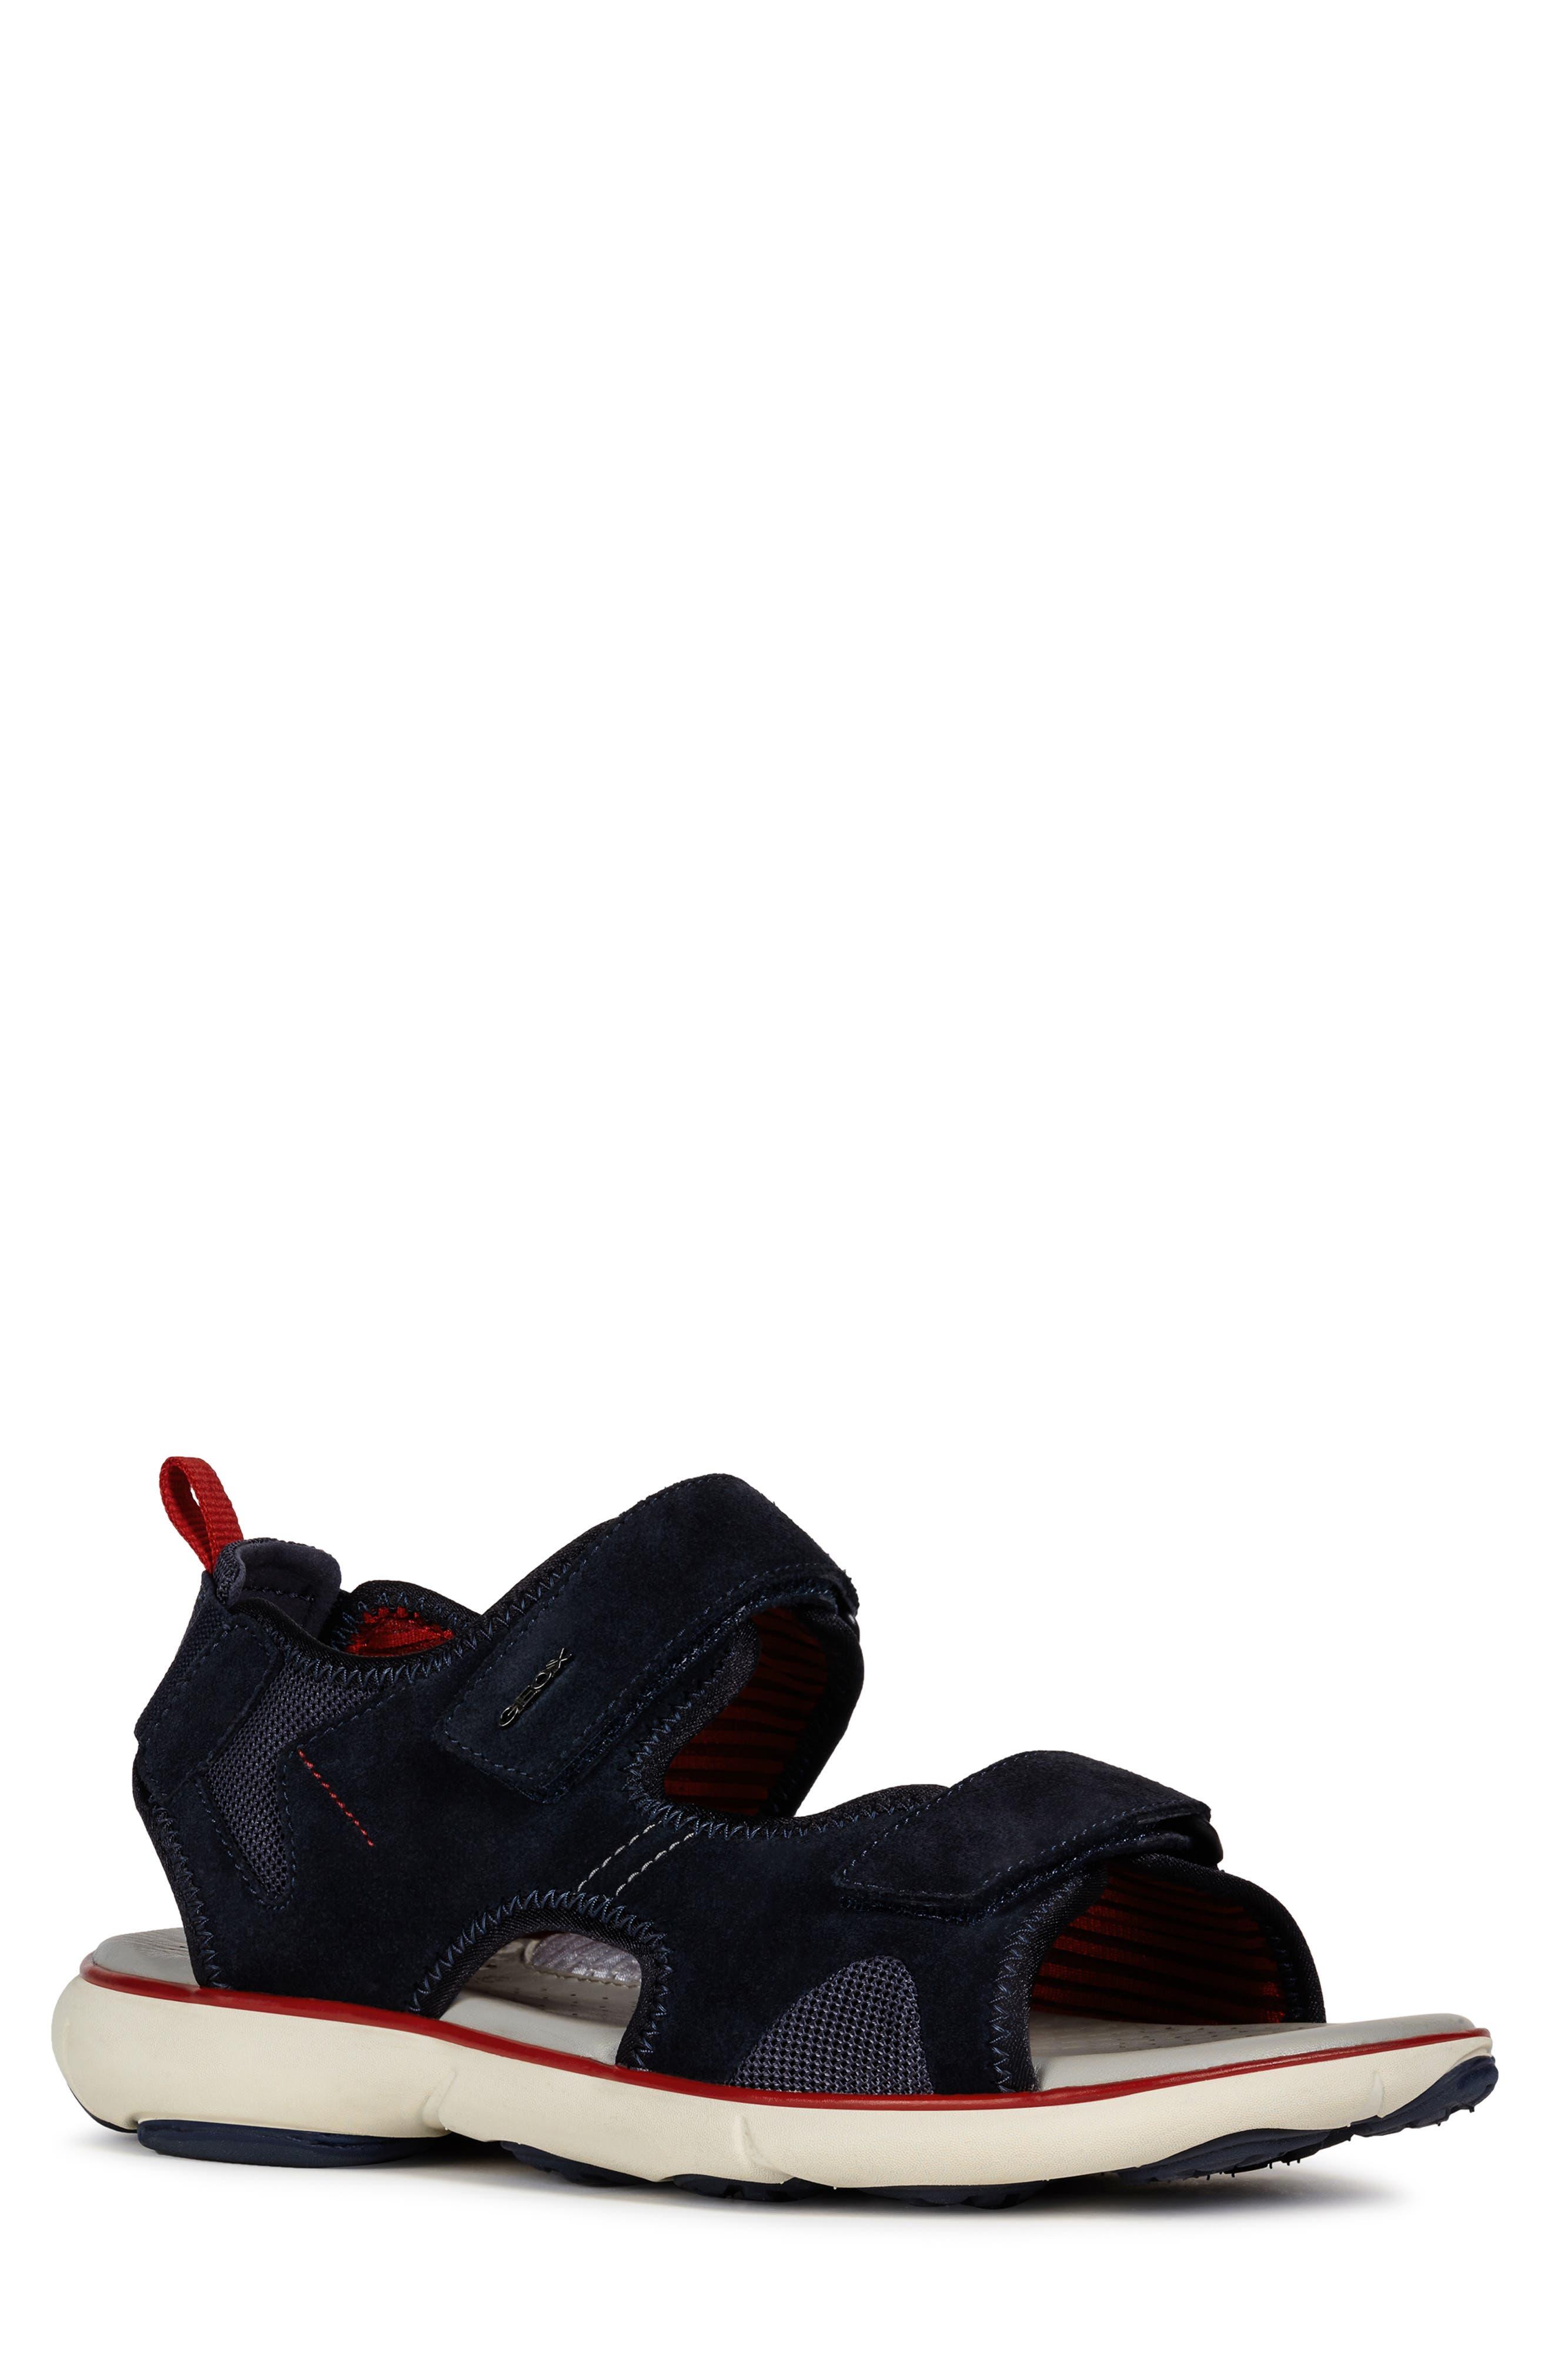 Geox Nebula L1 Sandal, Blue